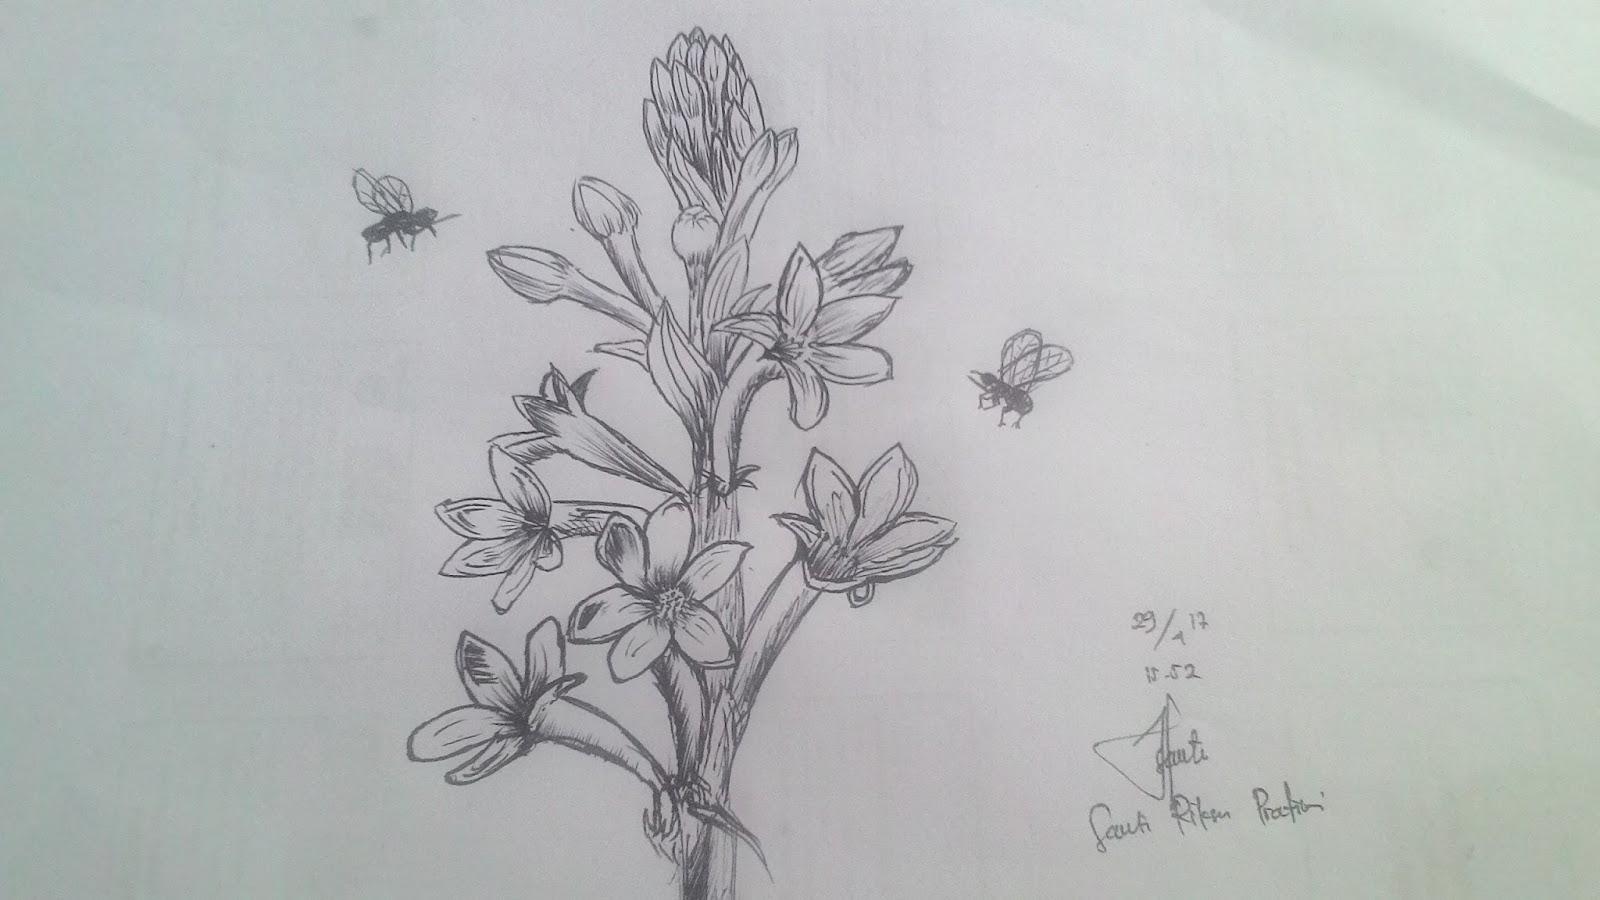 Sketsa Bunga Sedap Malam Kata Kata Bijak